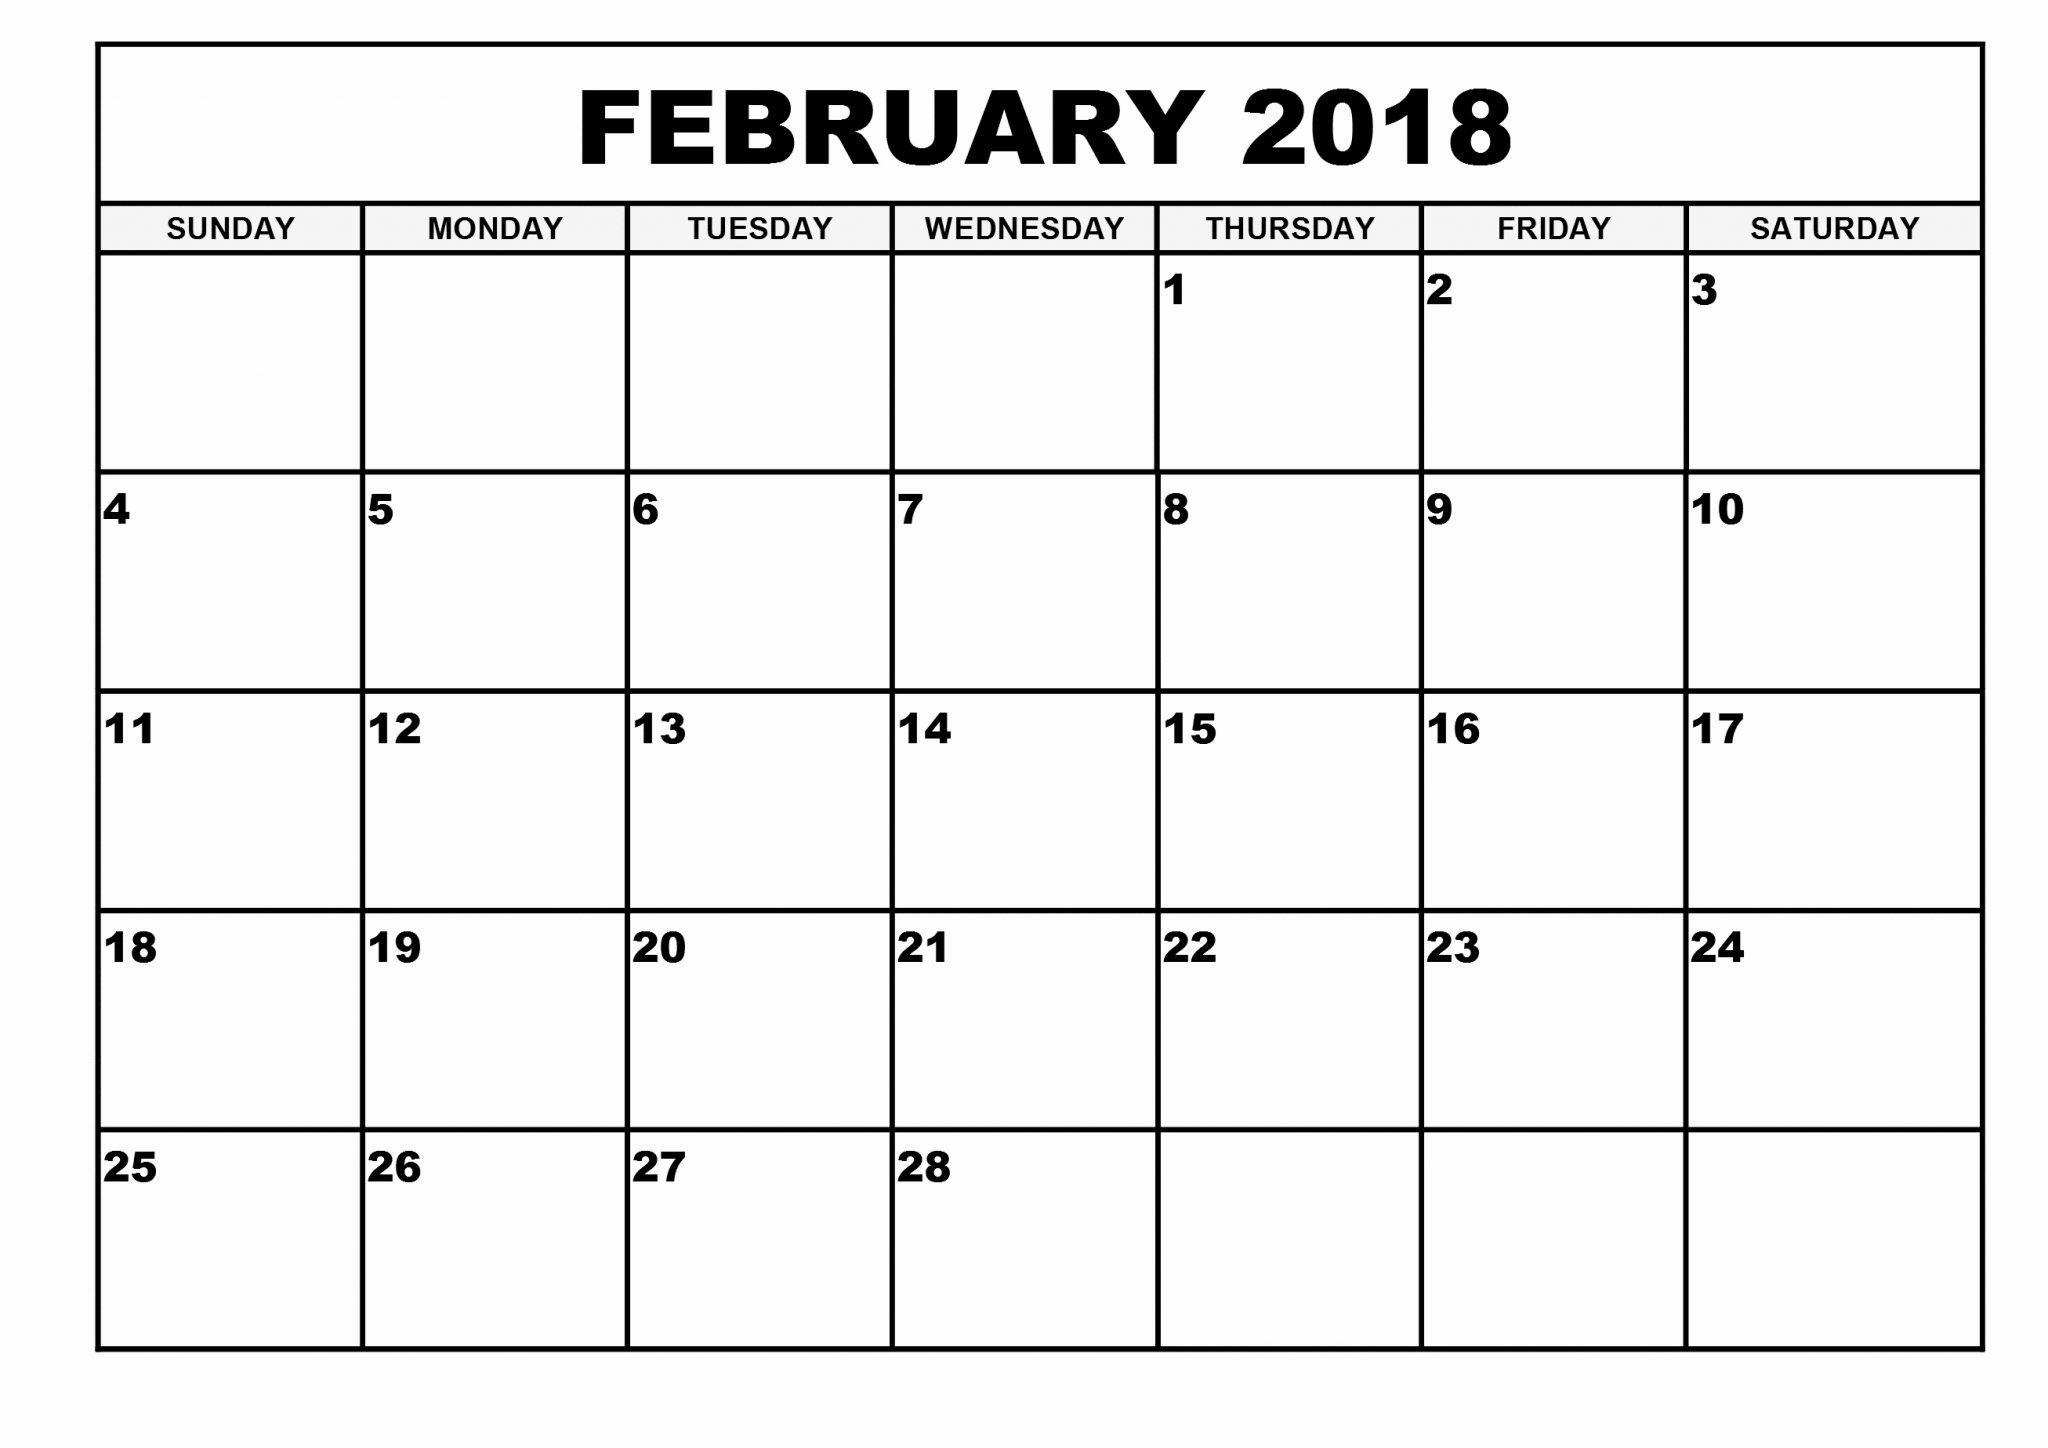 Free Feb 2020 Calendar Printable Templates with Holidays